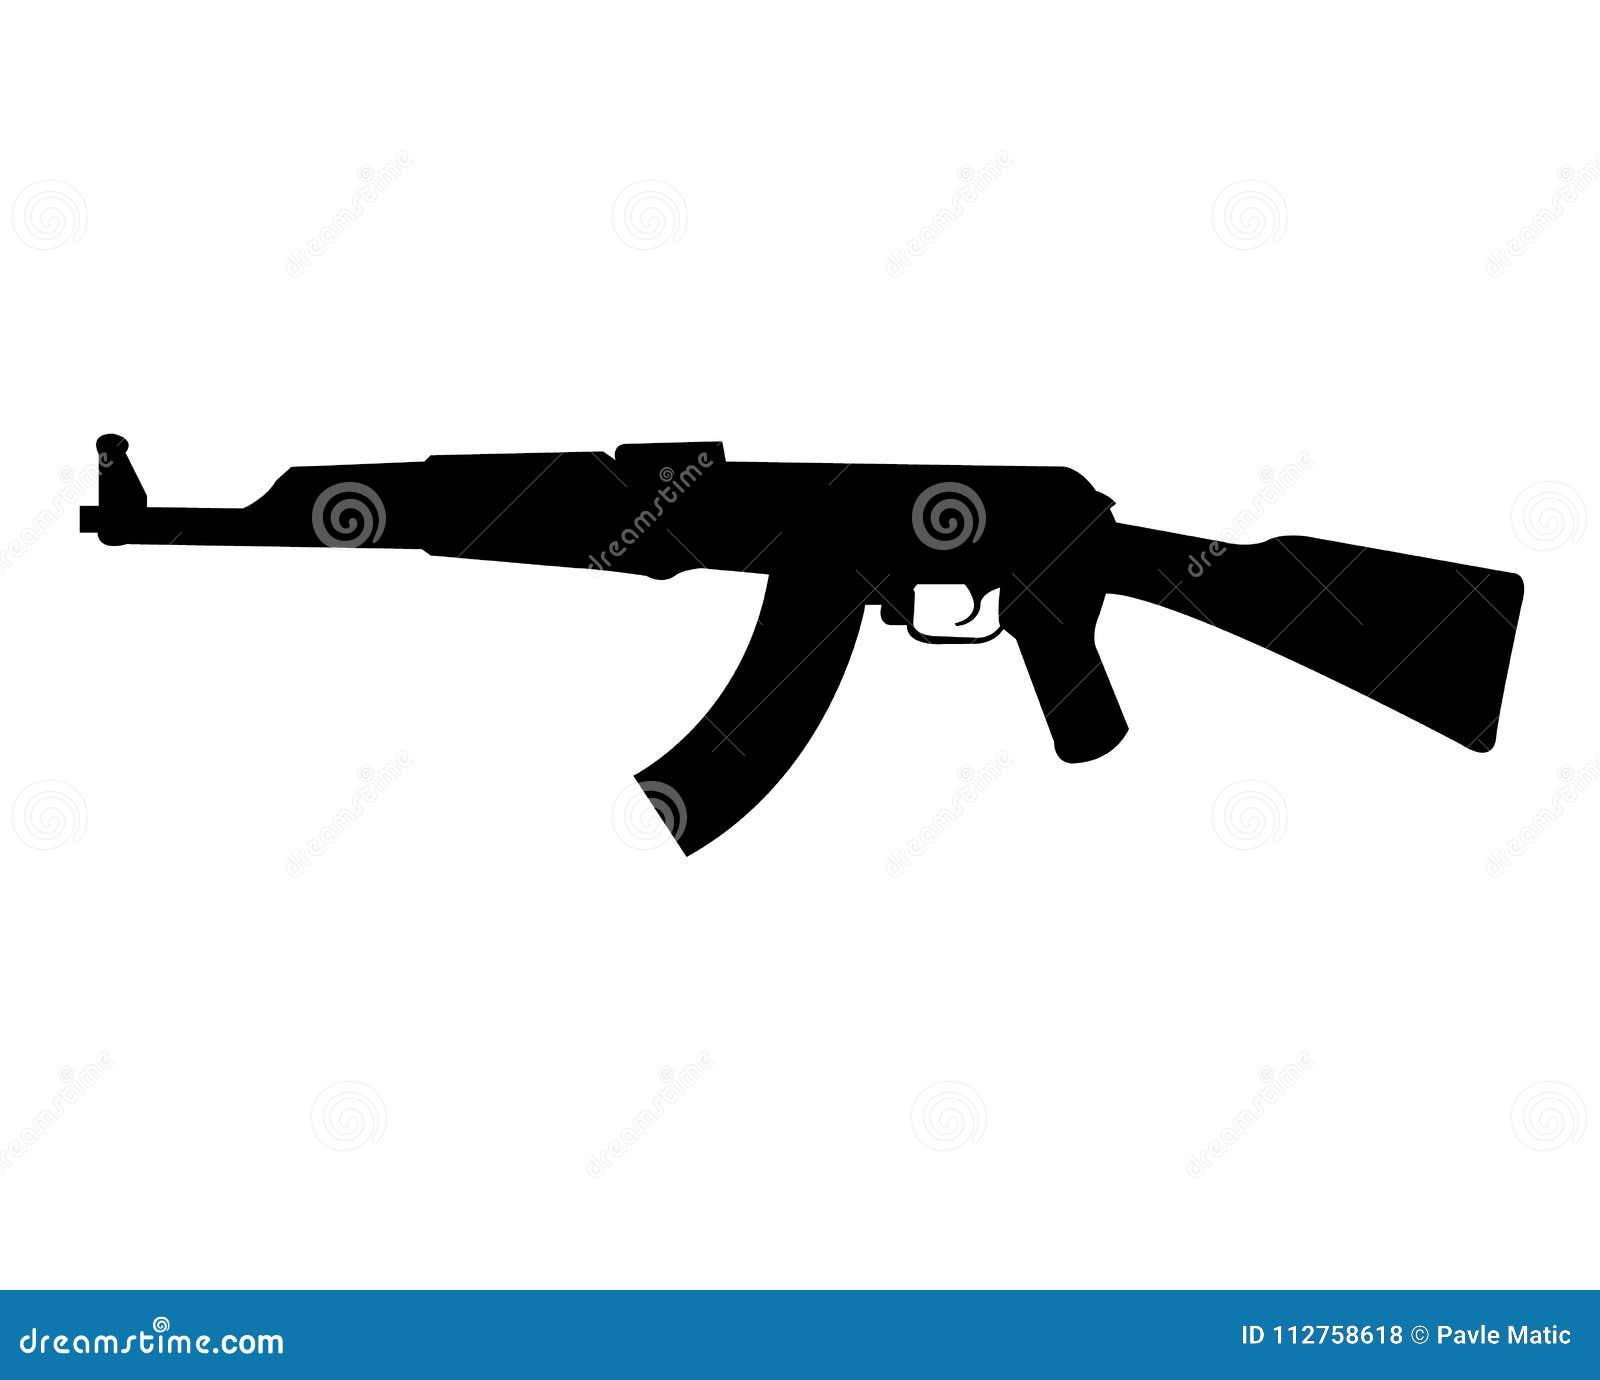 Ak 47 Rifle Silhouette Stock Vector Illustration Of Shot 112758618